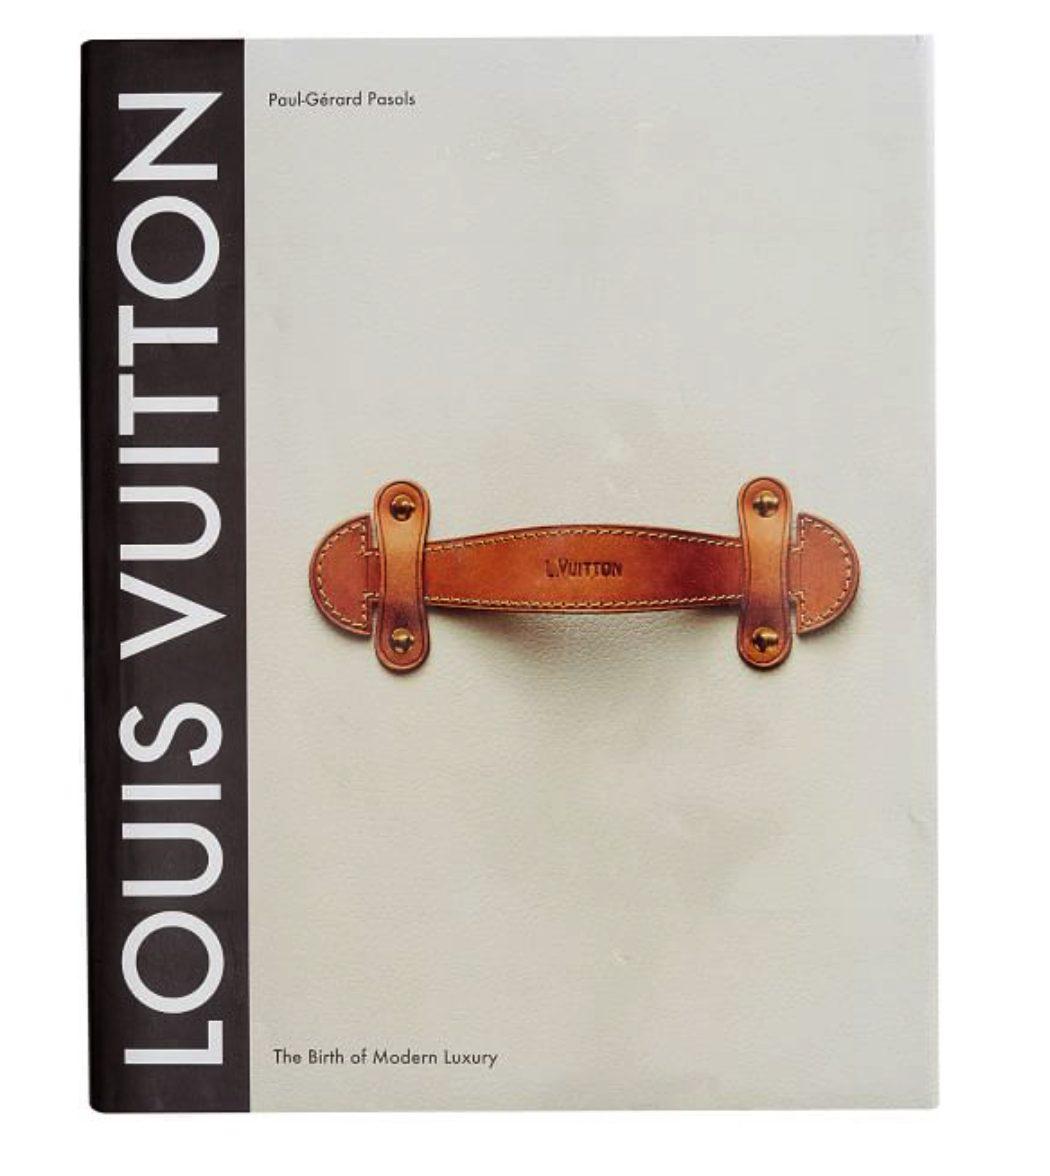 Louis Vuitton Coffee Table Books, Fashion Coffee Table Books